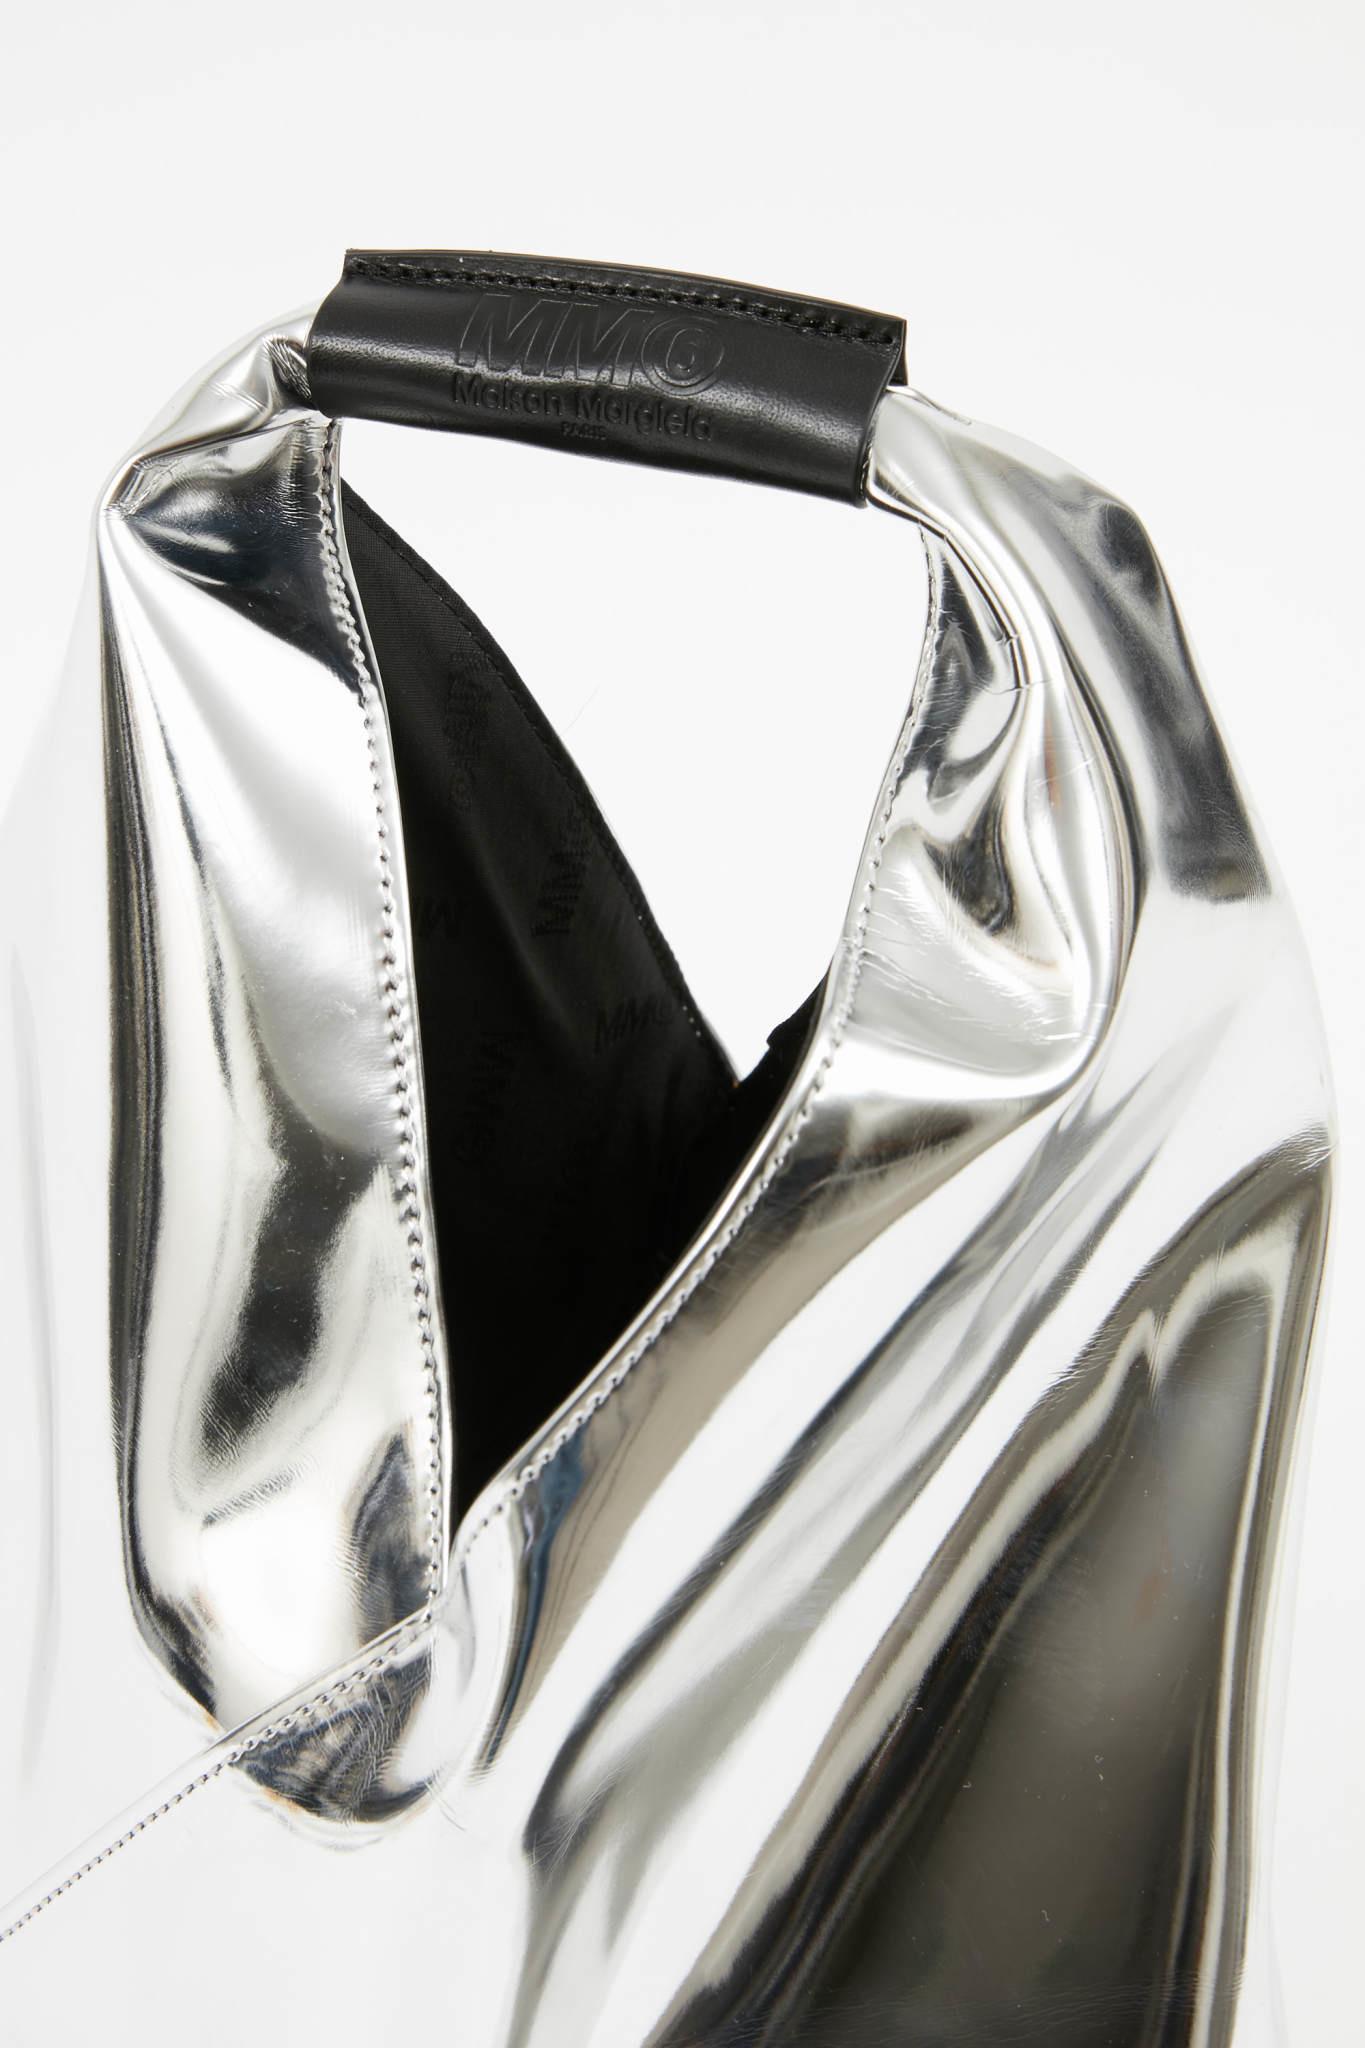 MM6 MAISON MARGIELA Small Metallic Silver Tote